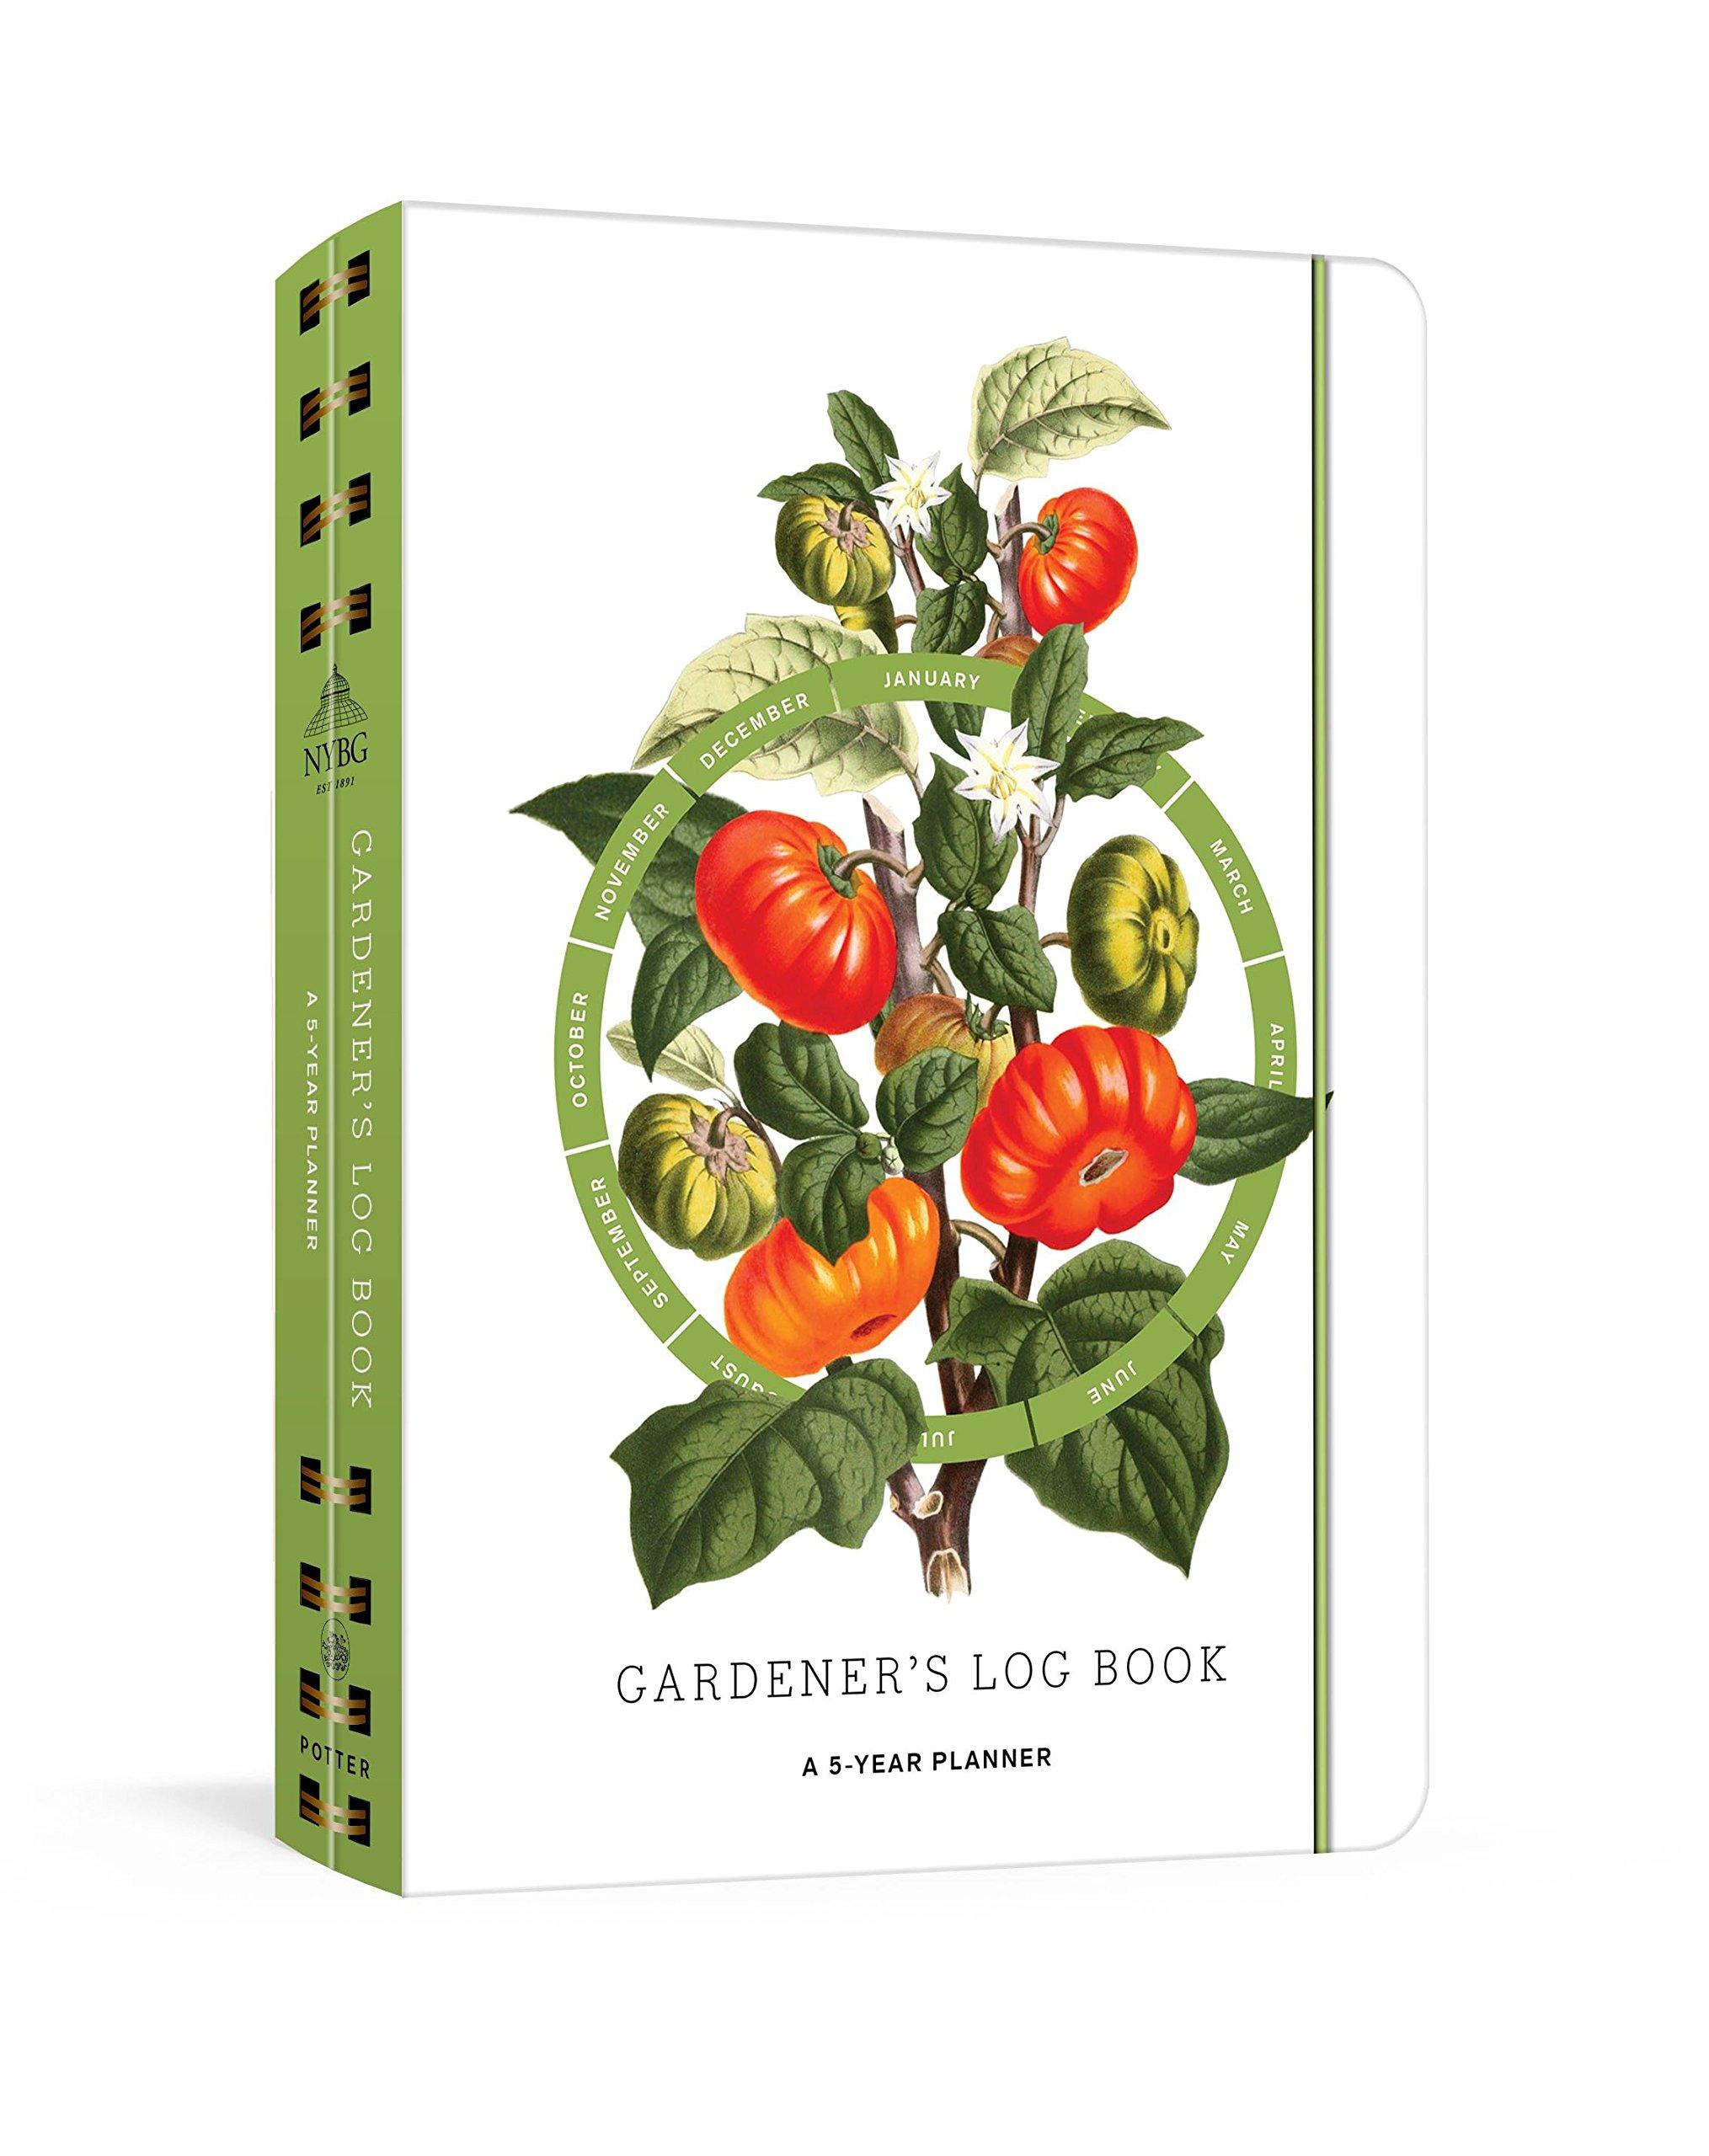 Gardener's Log Book: A 5-Year Planner (New York Botanical Garden)